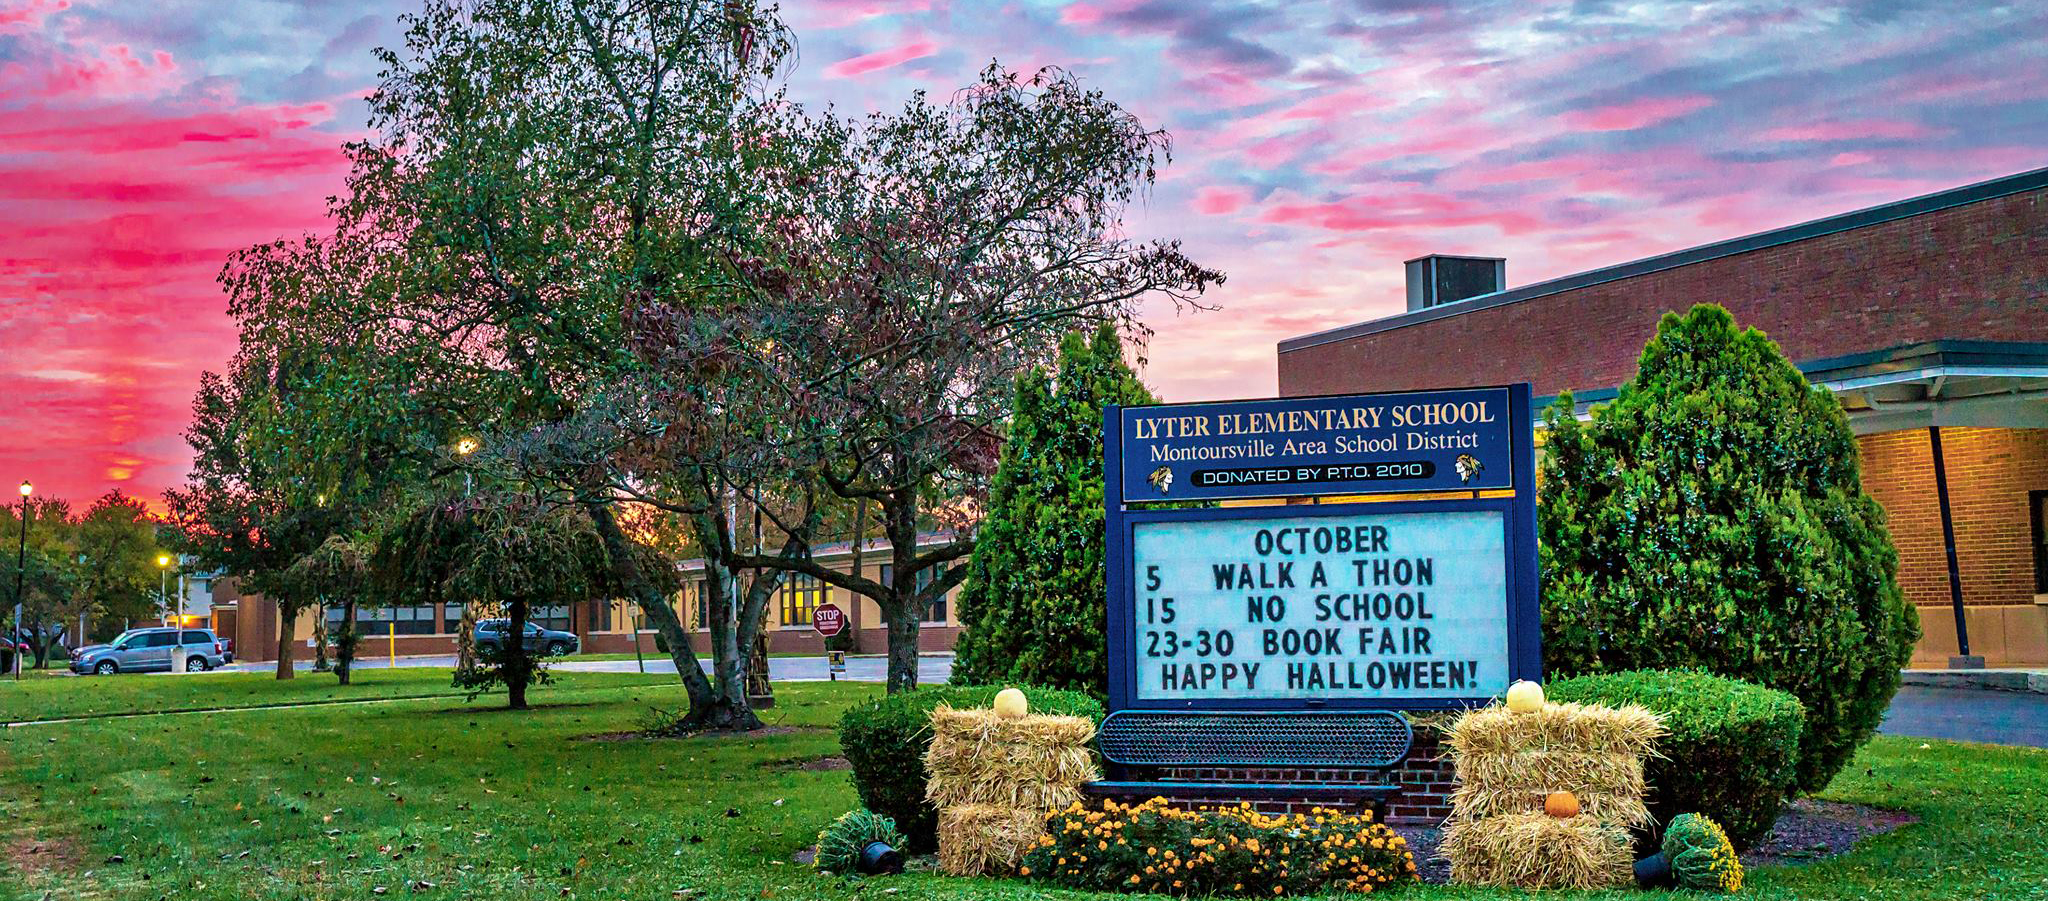 Lyter Elementary